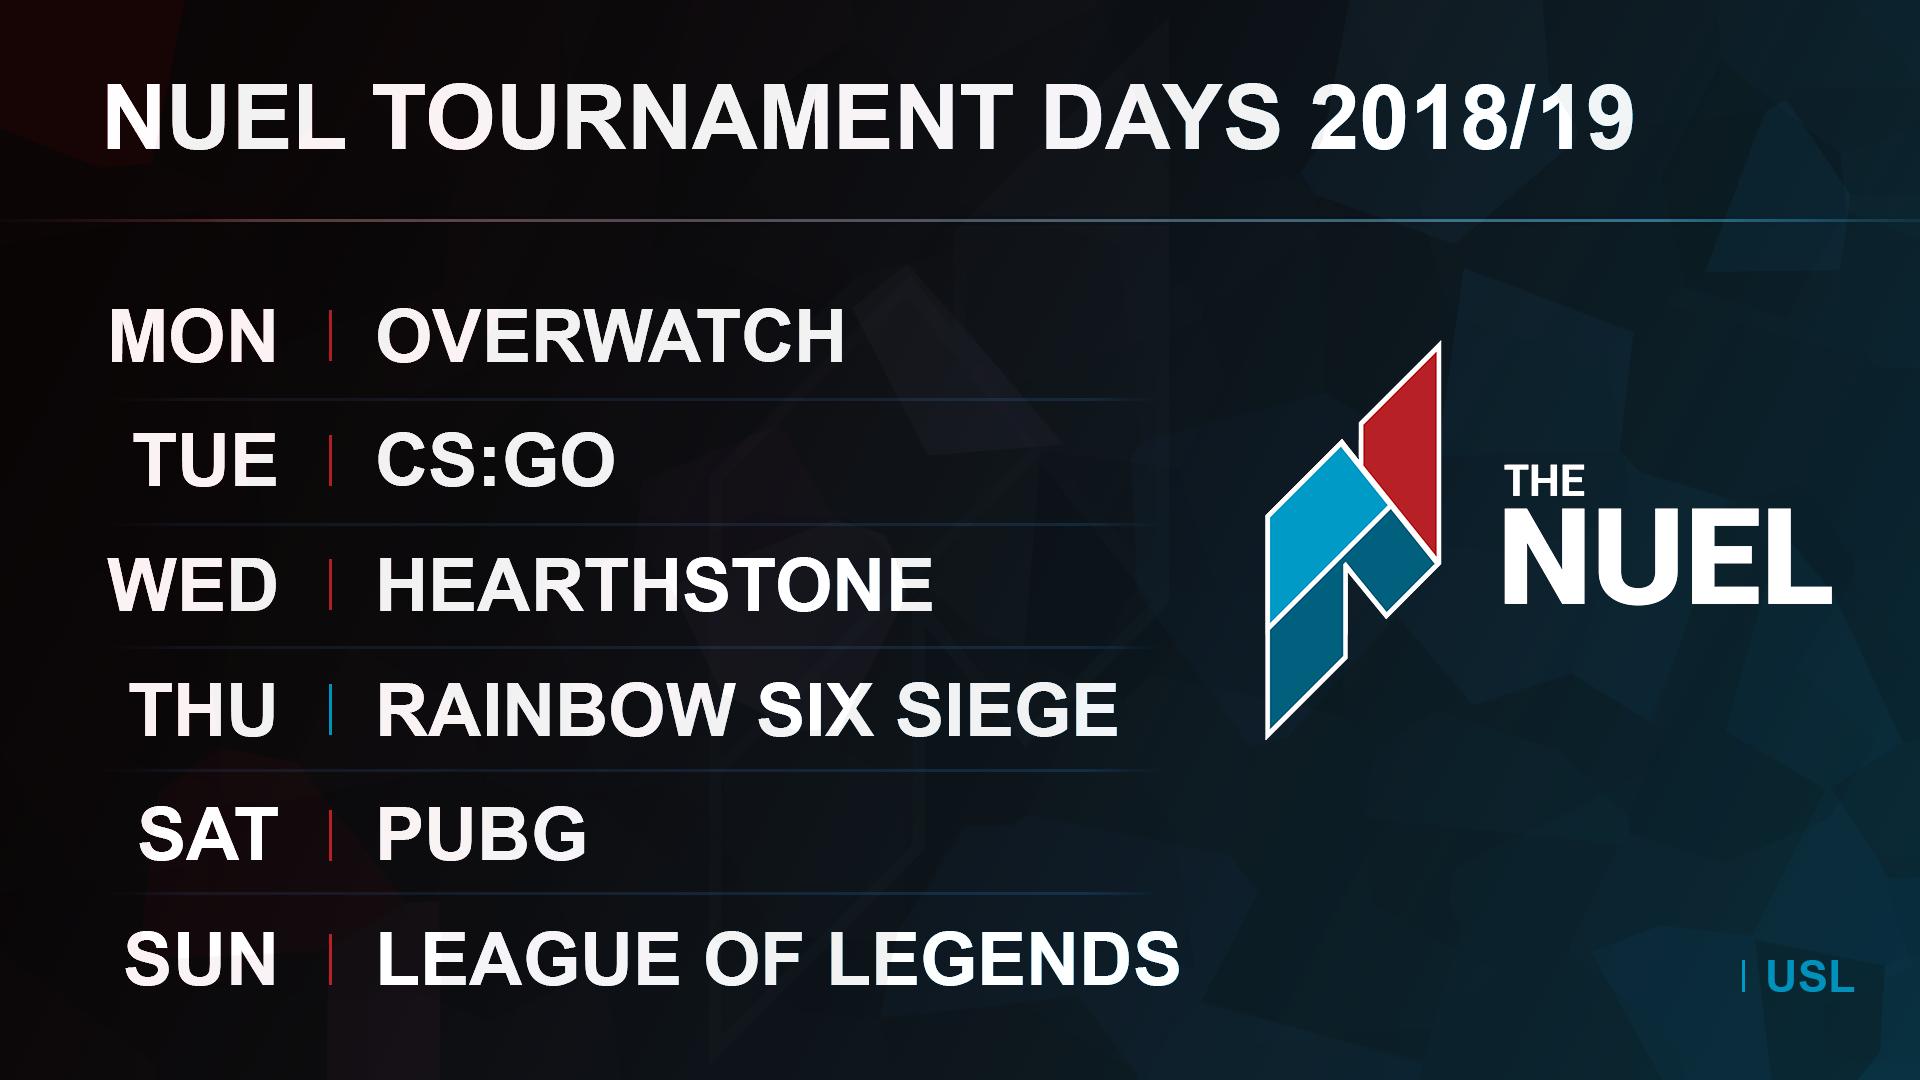 https://cdn.discordapp.com/attachments/273515455942230018/483033379198074880/NUEL_Tournament_Days.png